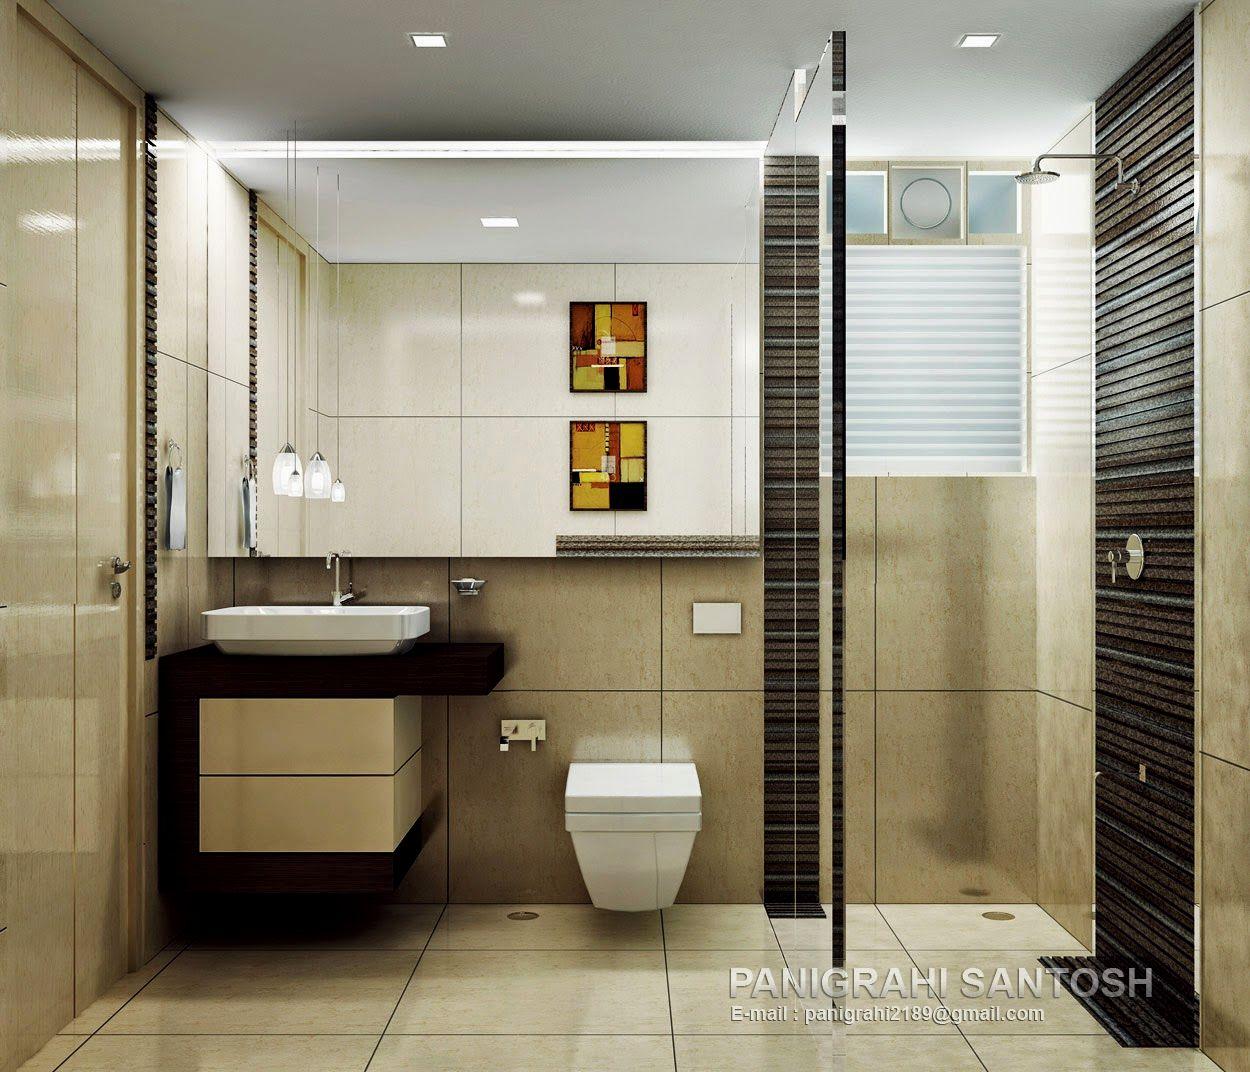 modern how to draw a bathroom model-Beautiful How to Draw A Bathroom Construction